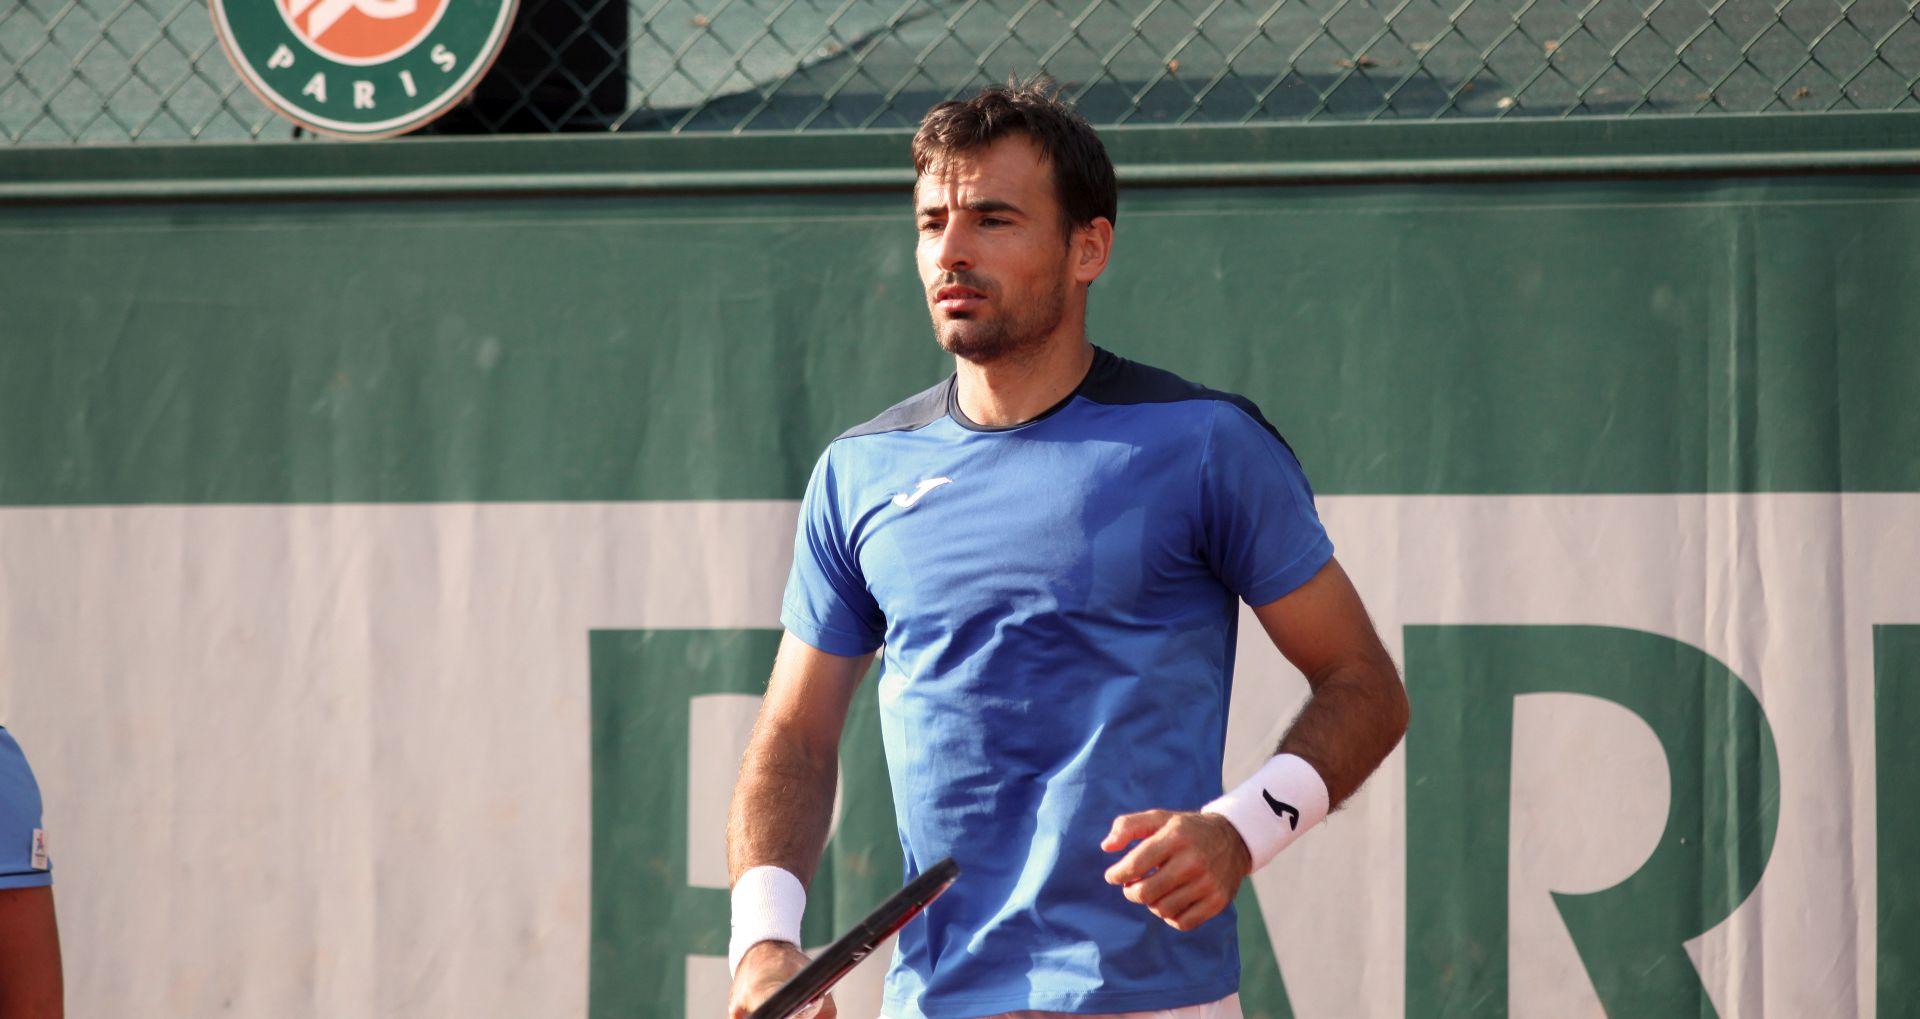 Australian Open: Dodig, Pavić i Škugor u 3. kolu parova, uspješan start Jurak